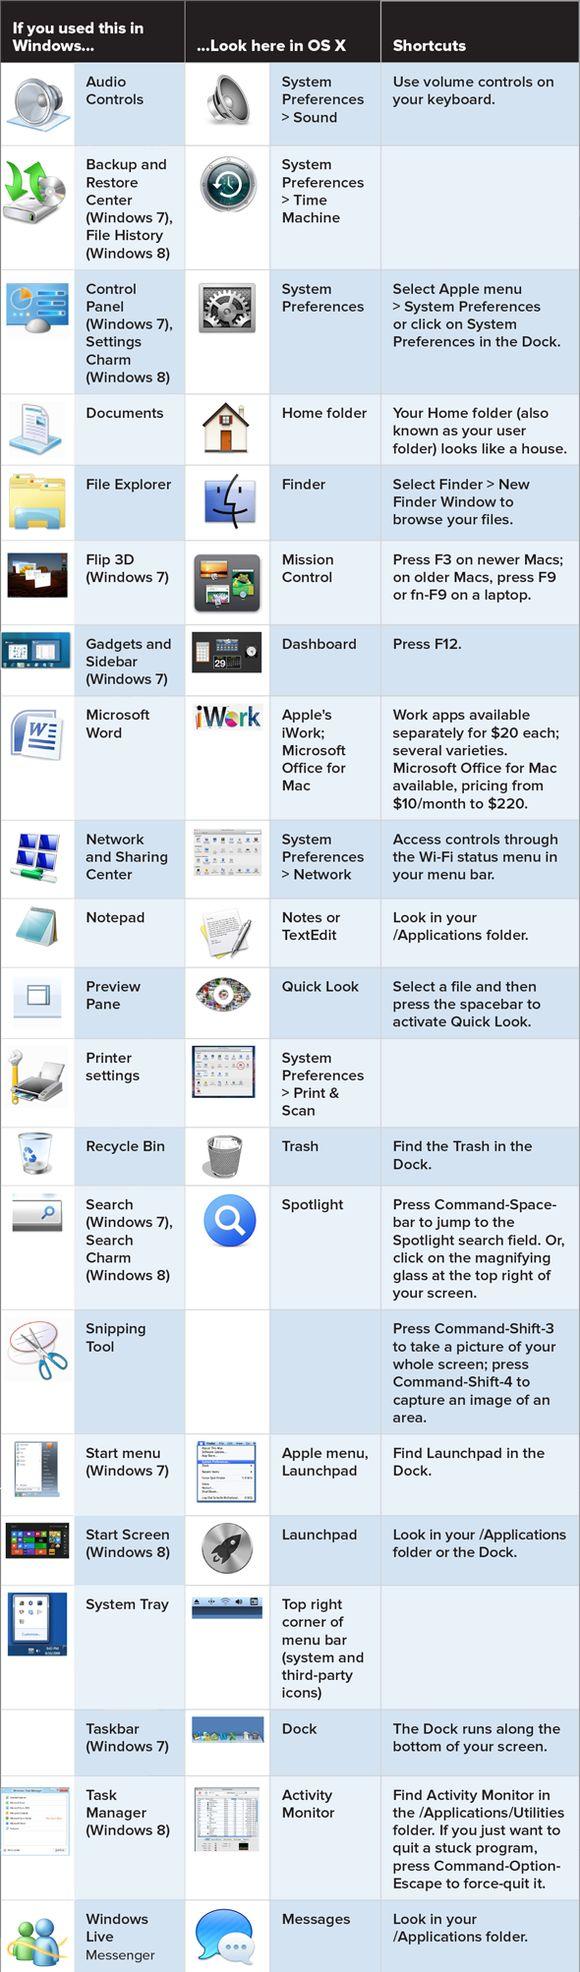 Switch To Mac: Translating Windows To Os X [macworld]